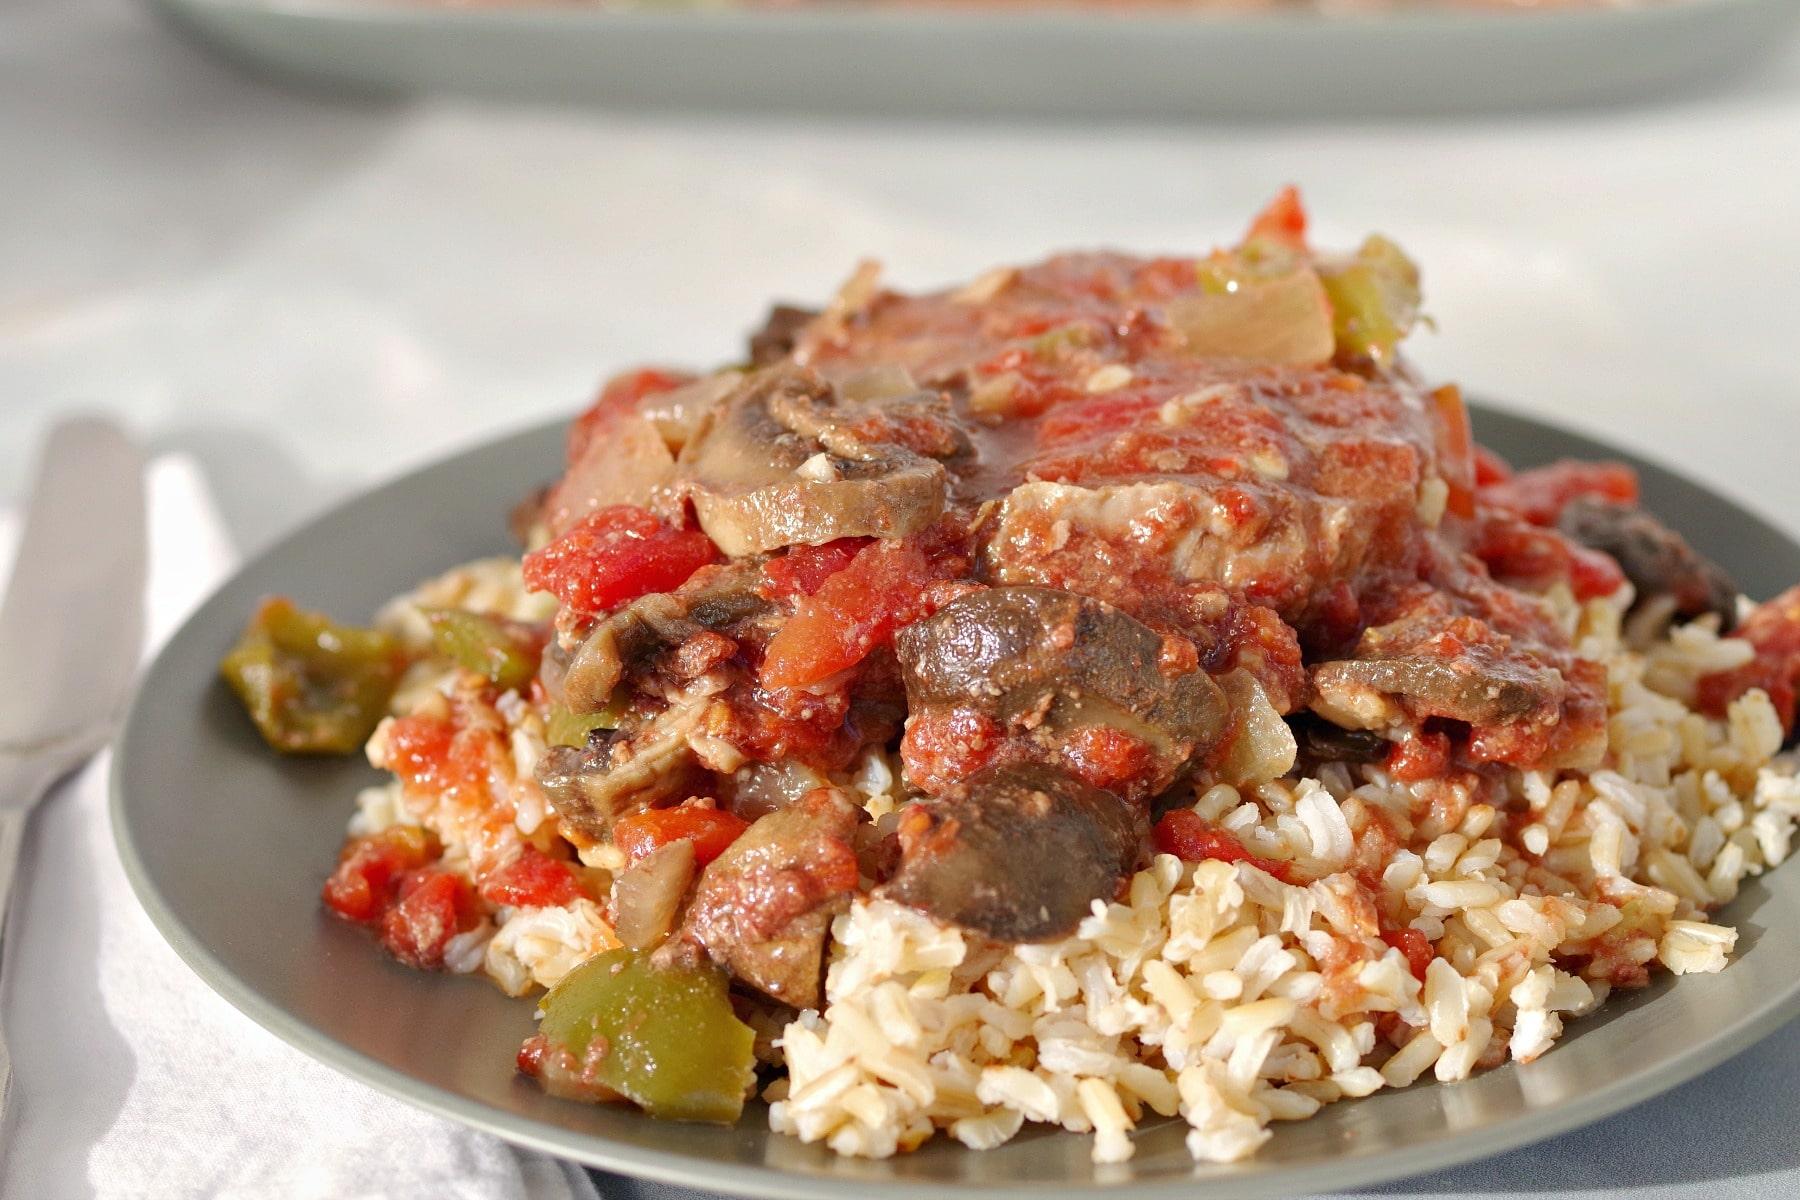 Slow Cooker Swiss Steak on Rice (on green plate)